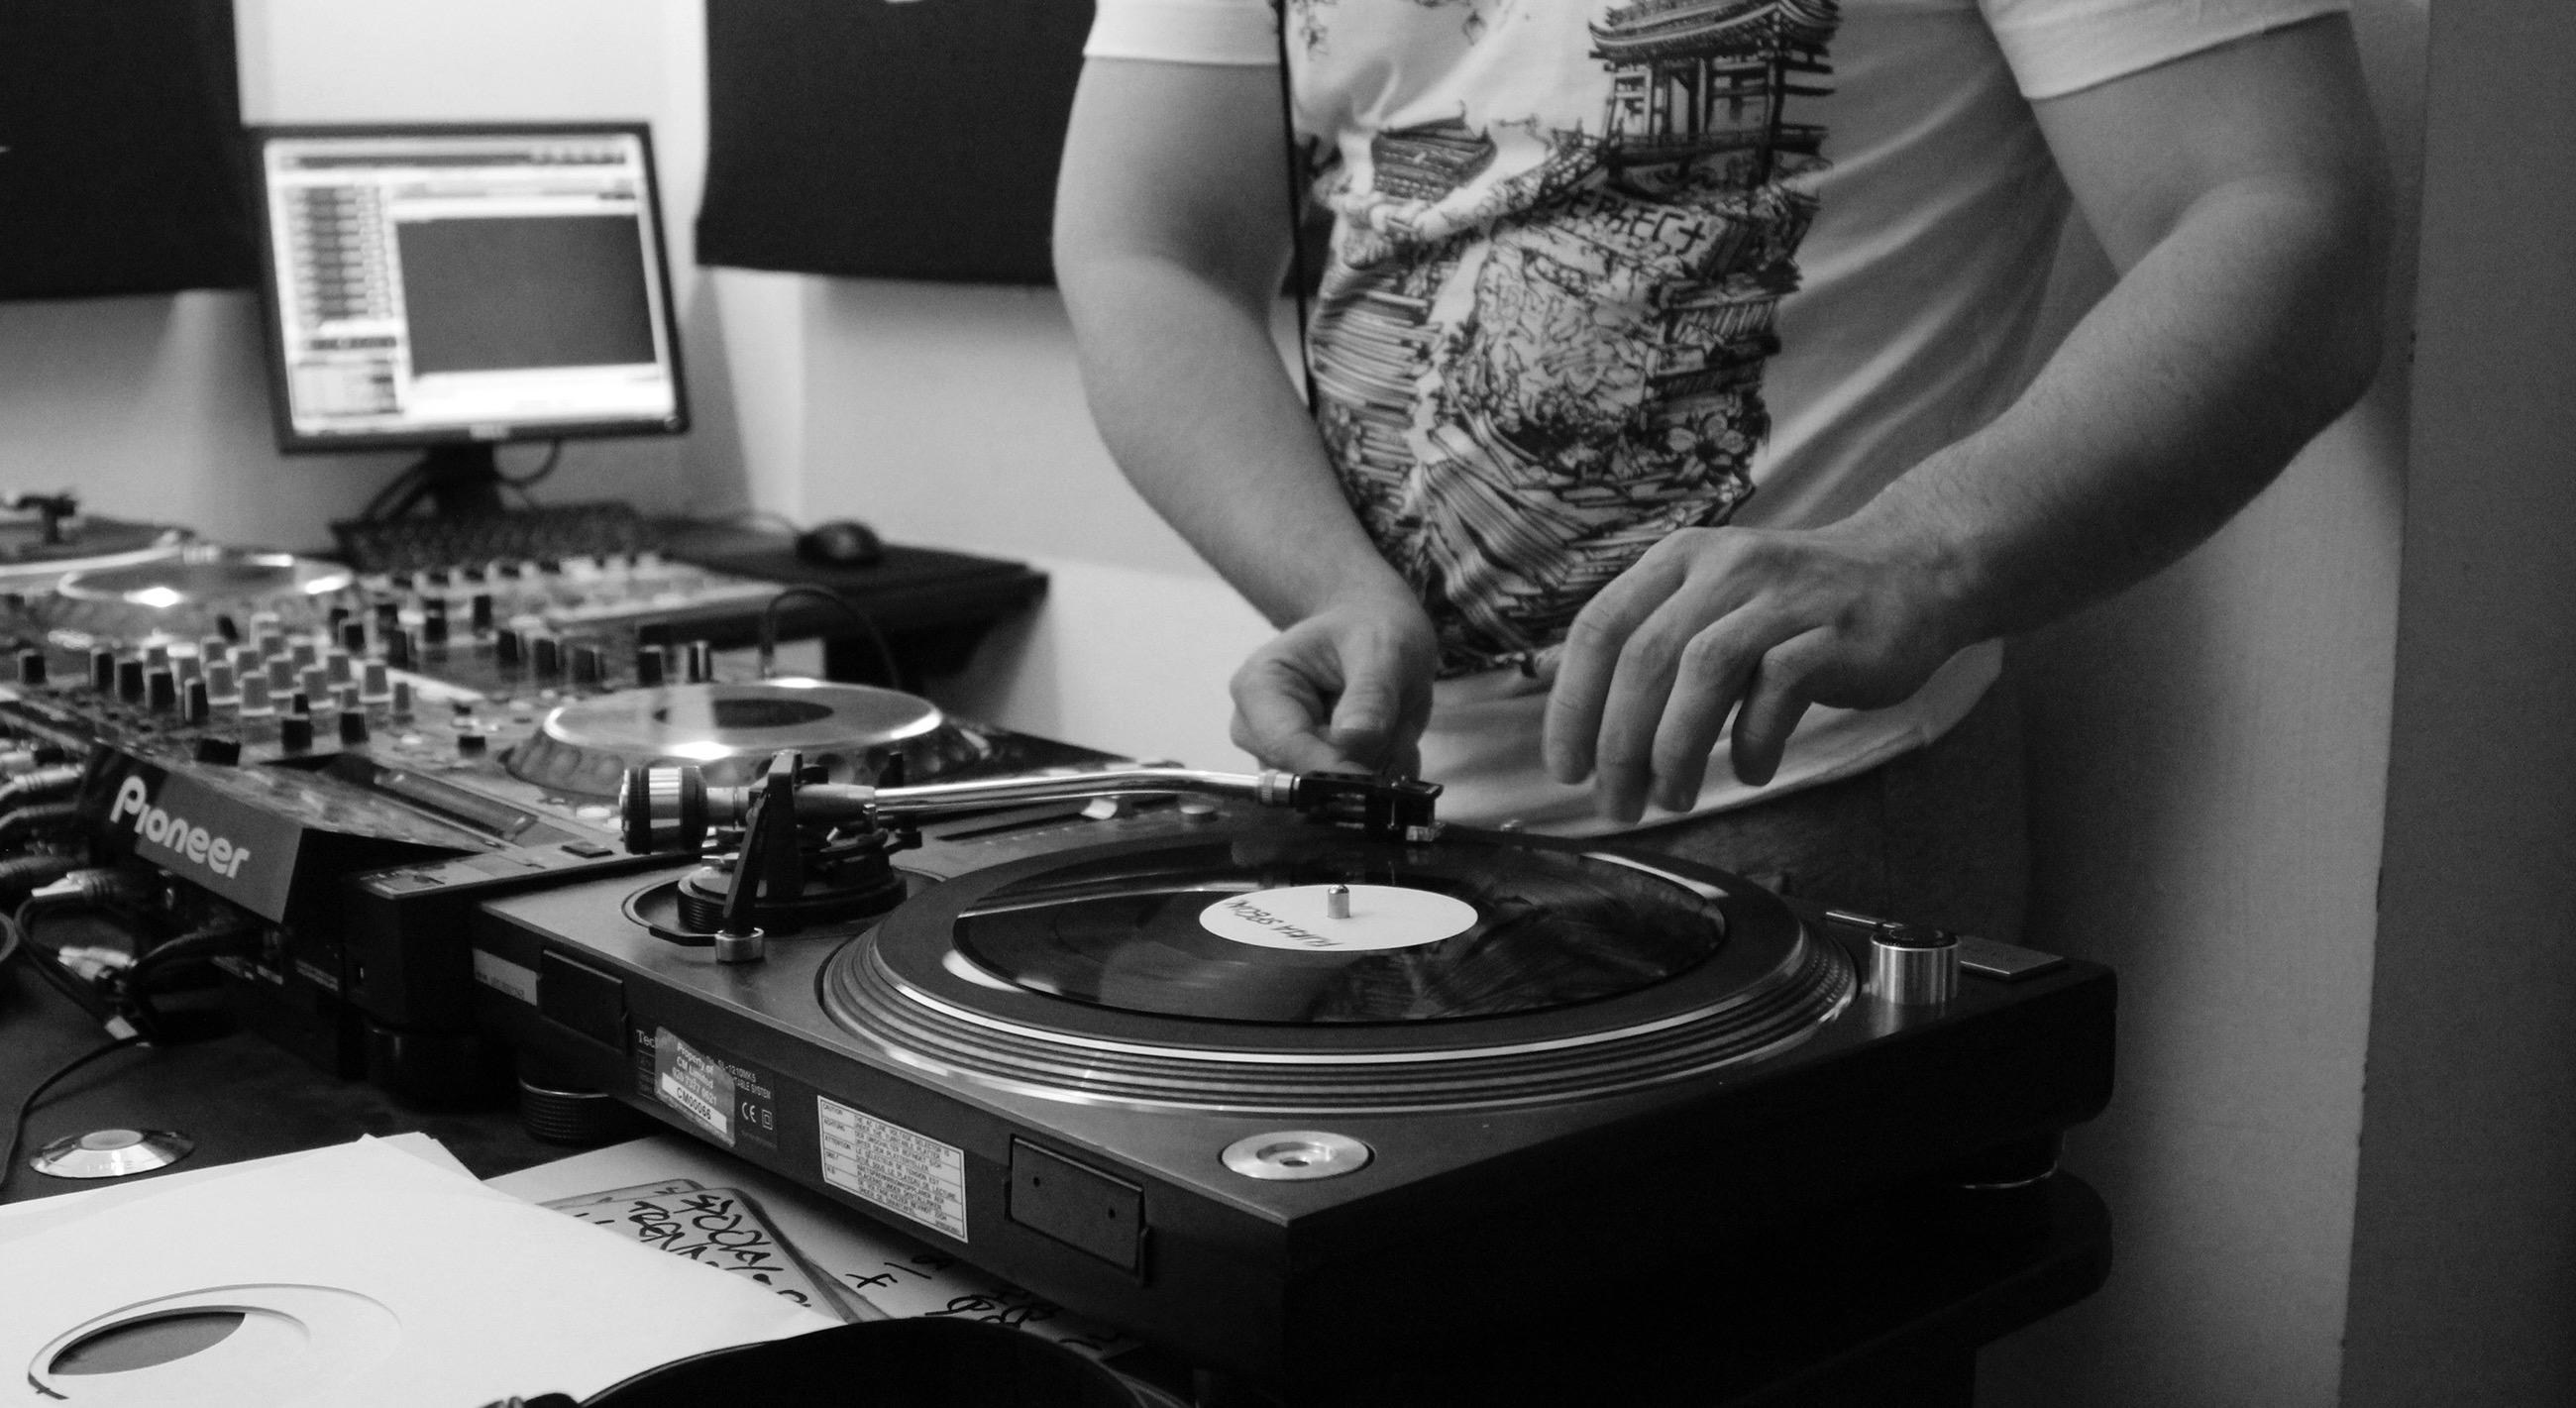 DJ Score5, ScoreFive, Score Five, Grime, PyroRadio, PyroRadio.com, Dubplate, Dubplates